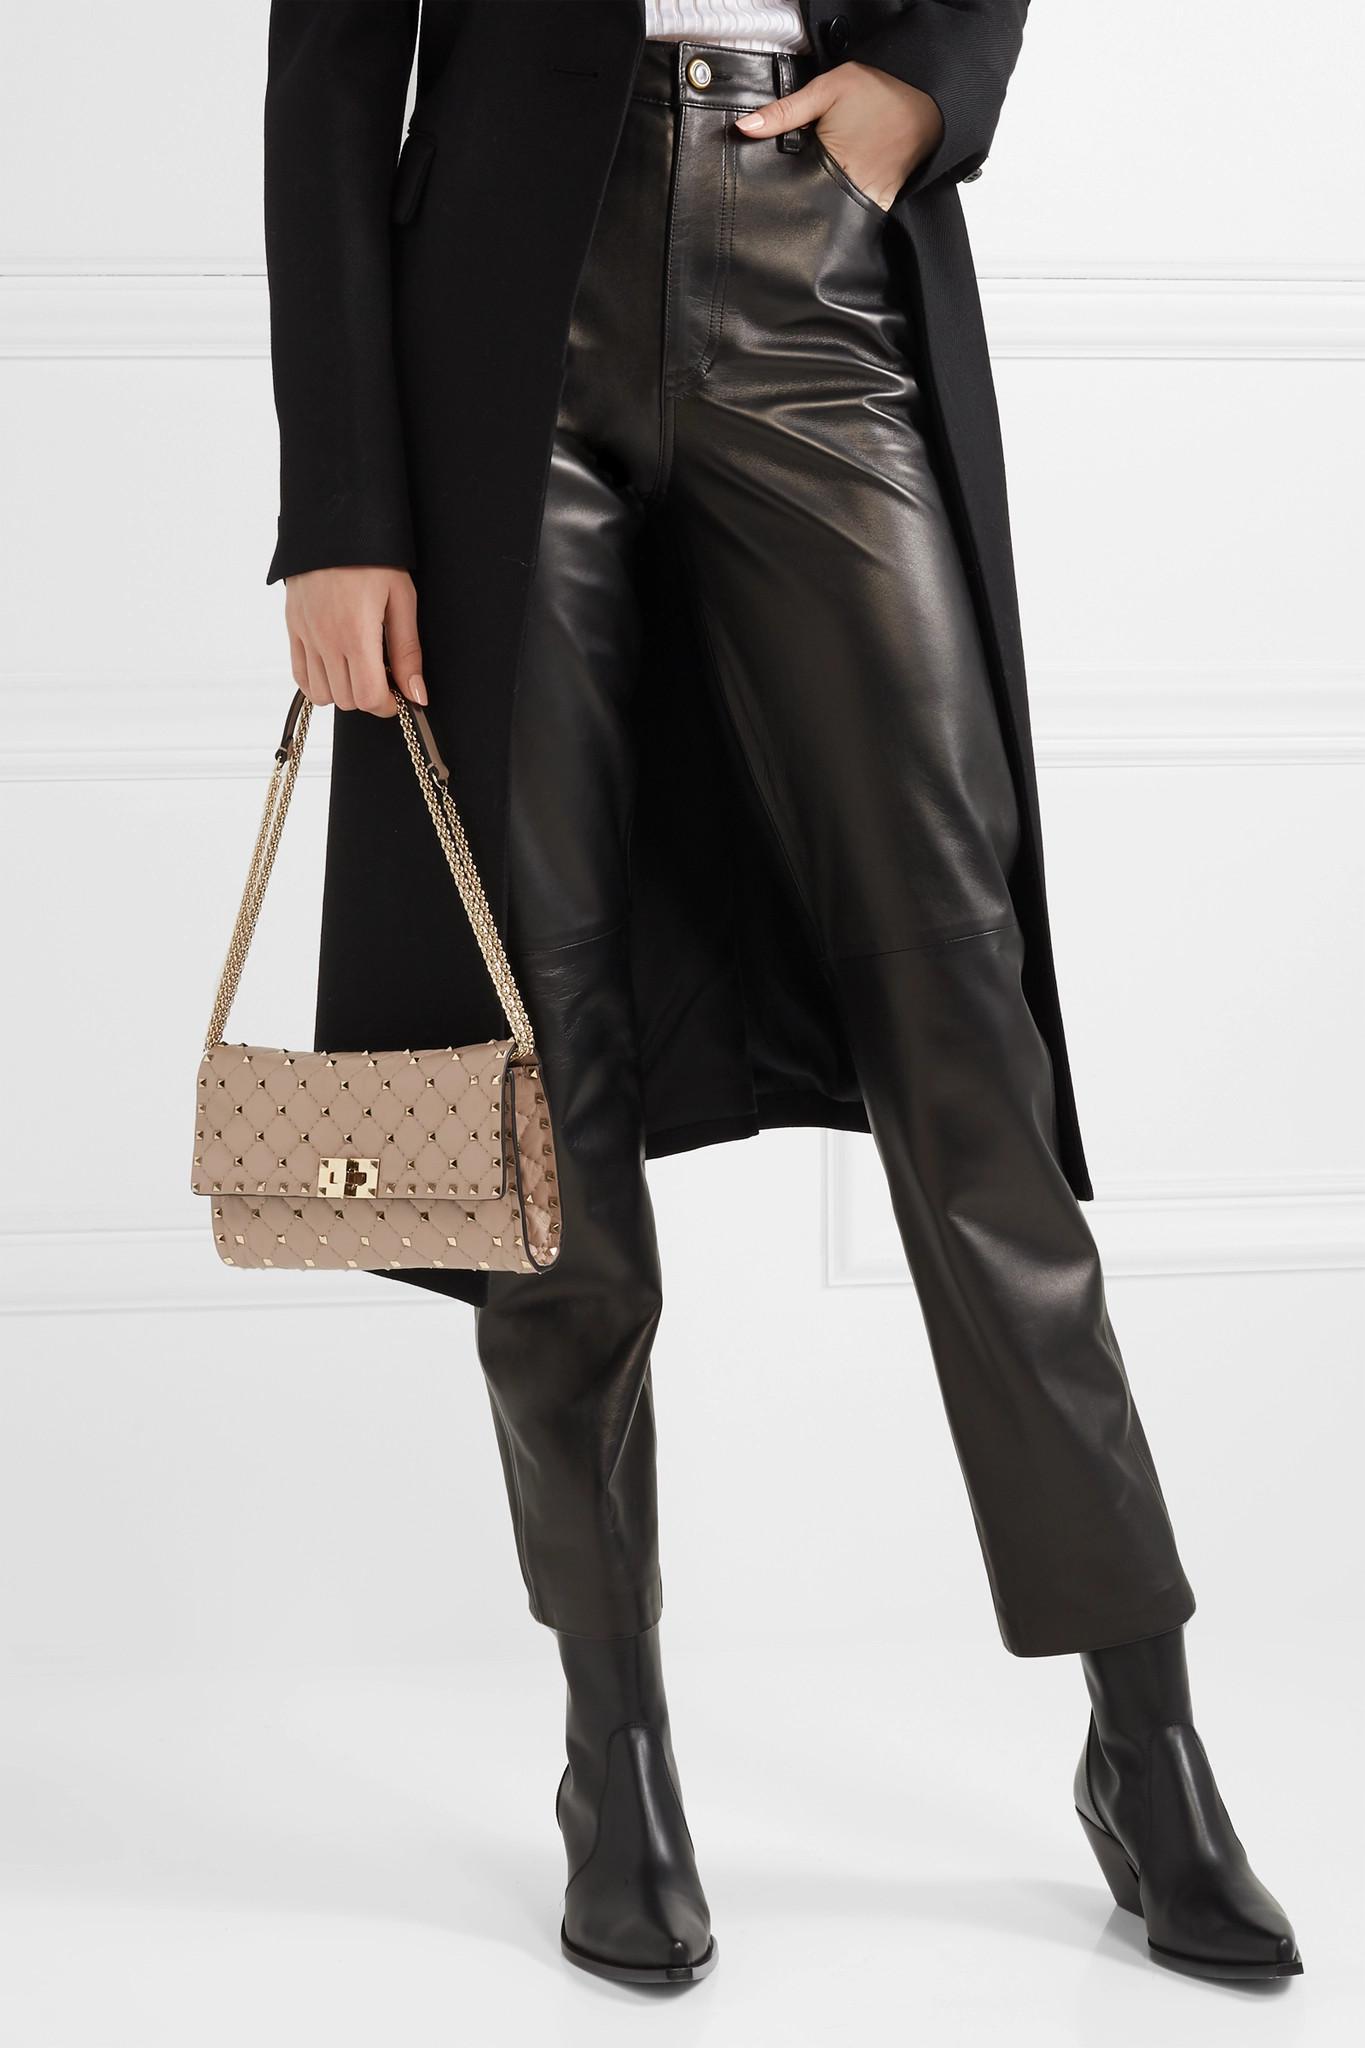 9e032a21a3cf Valentino Garavani The Rockstud Spike Quilted Leather Shoulder Bag ...